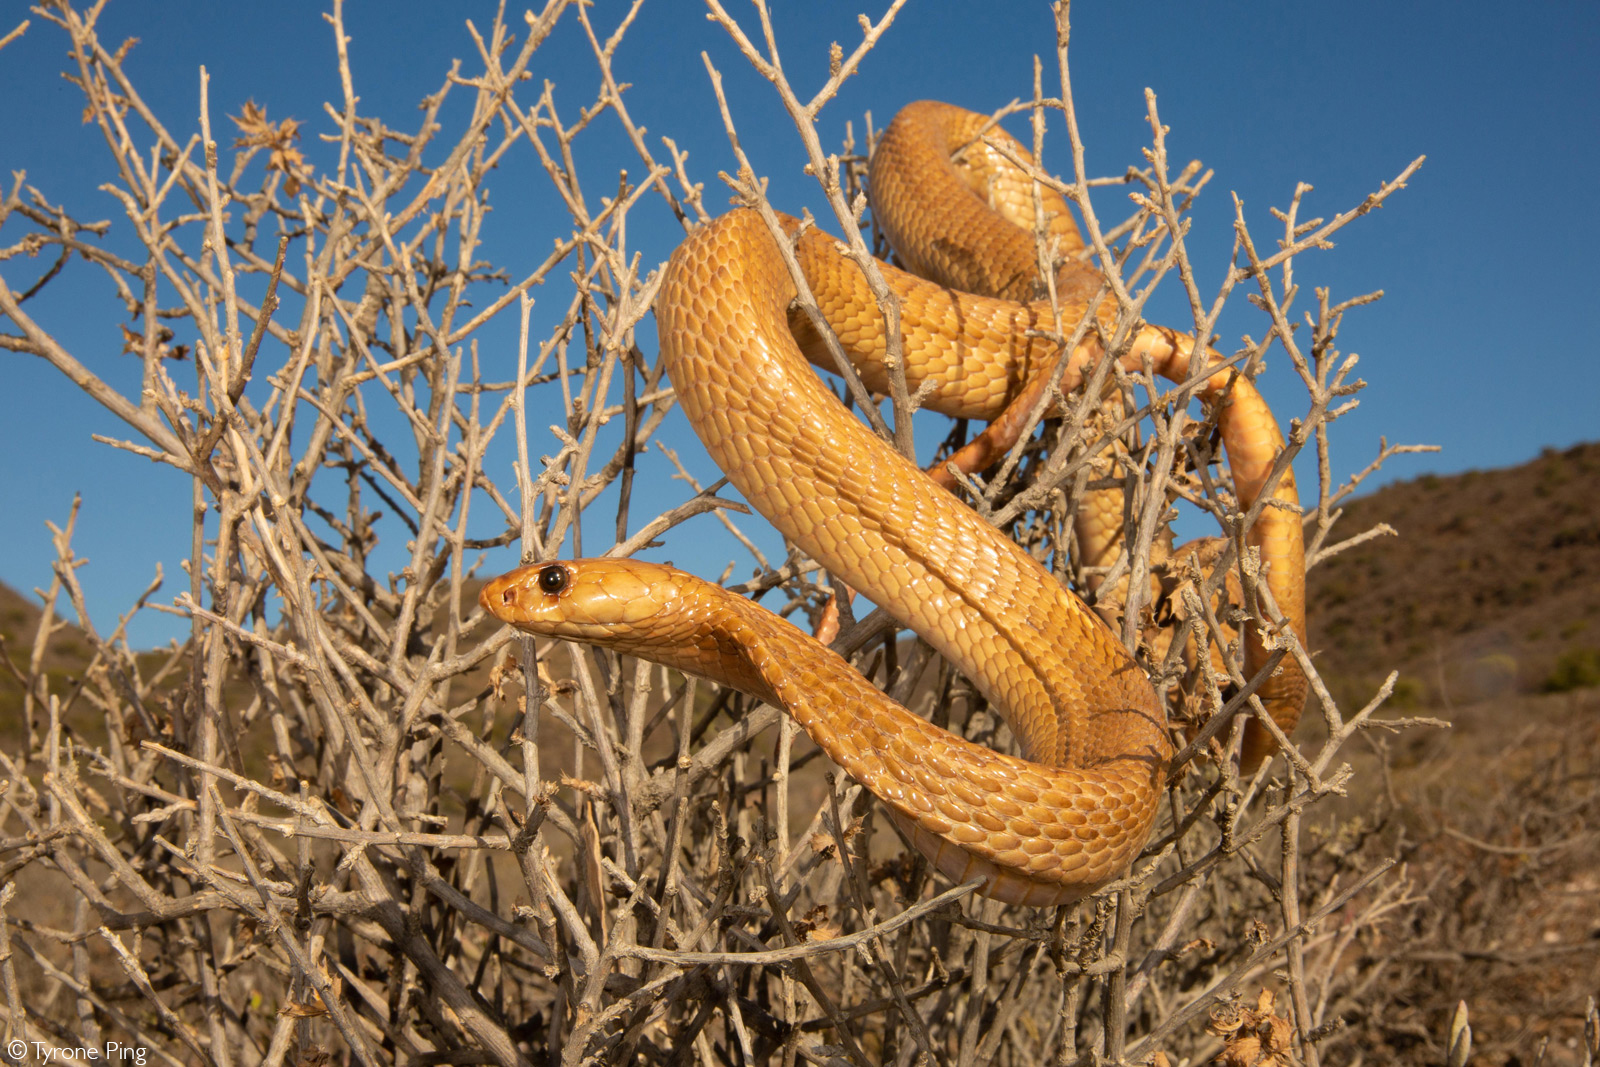 Cape cobra (Naja nivea). Montagu, Western Cape, South Africa © Tyrone Ping